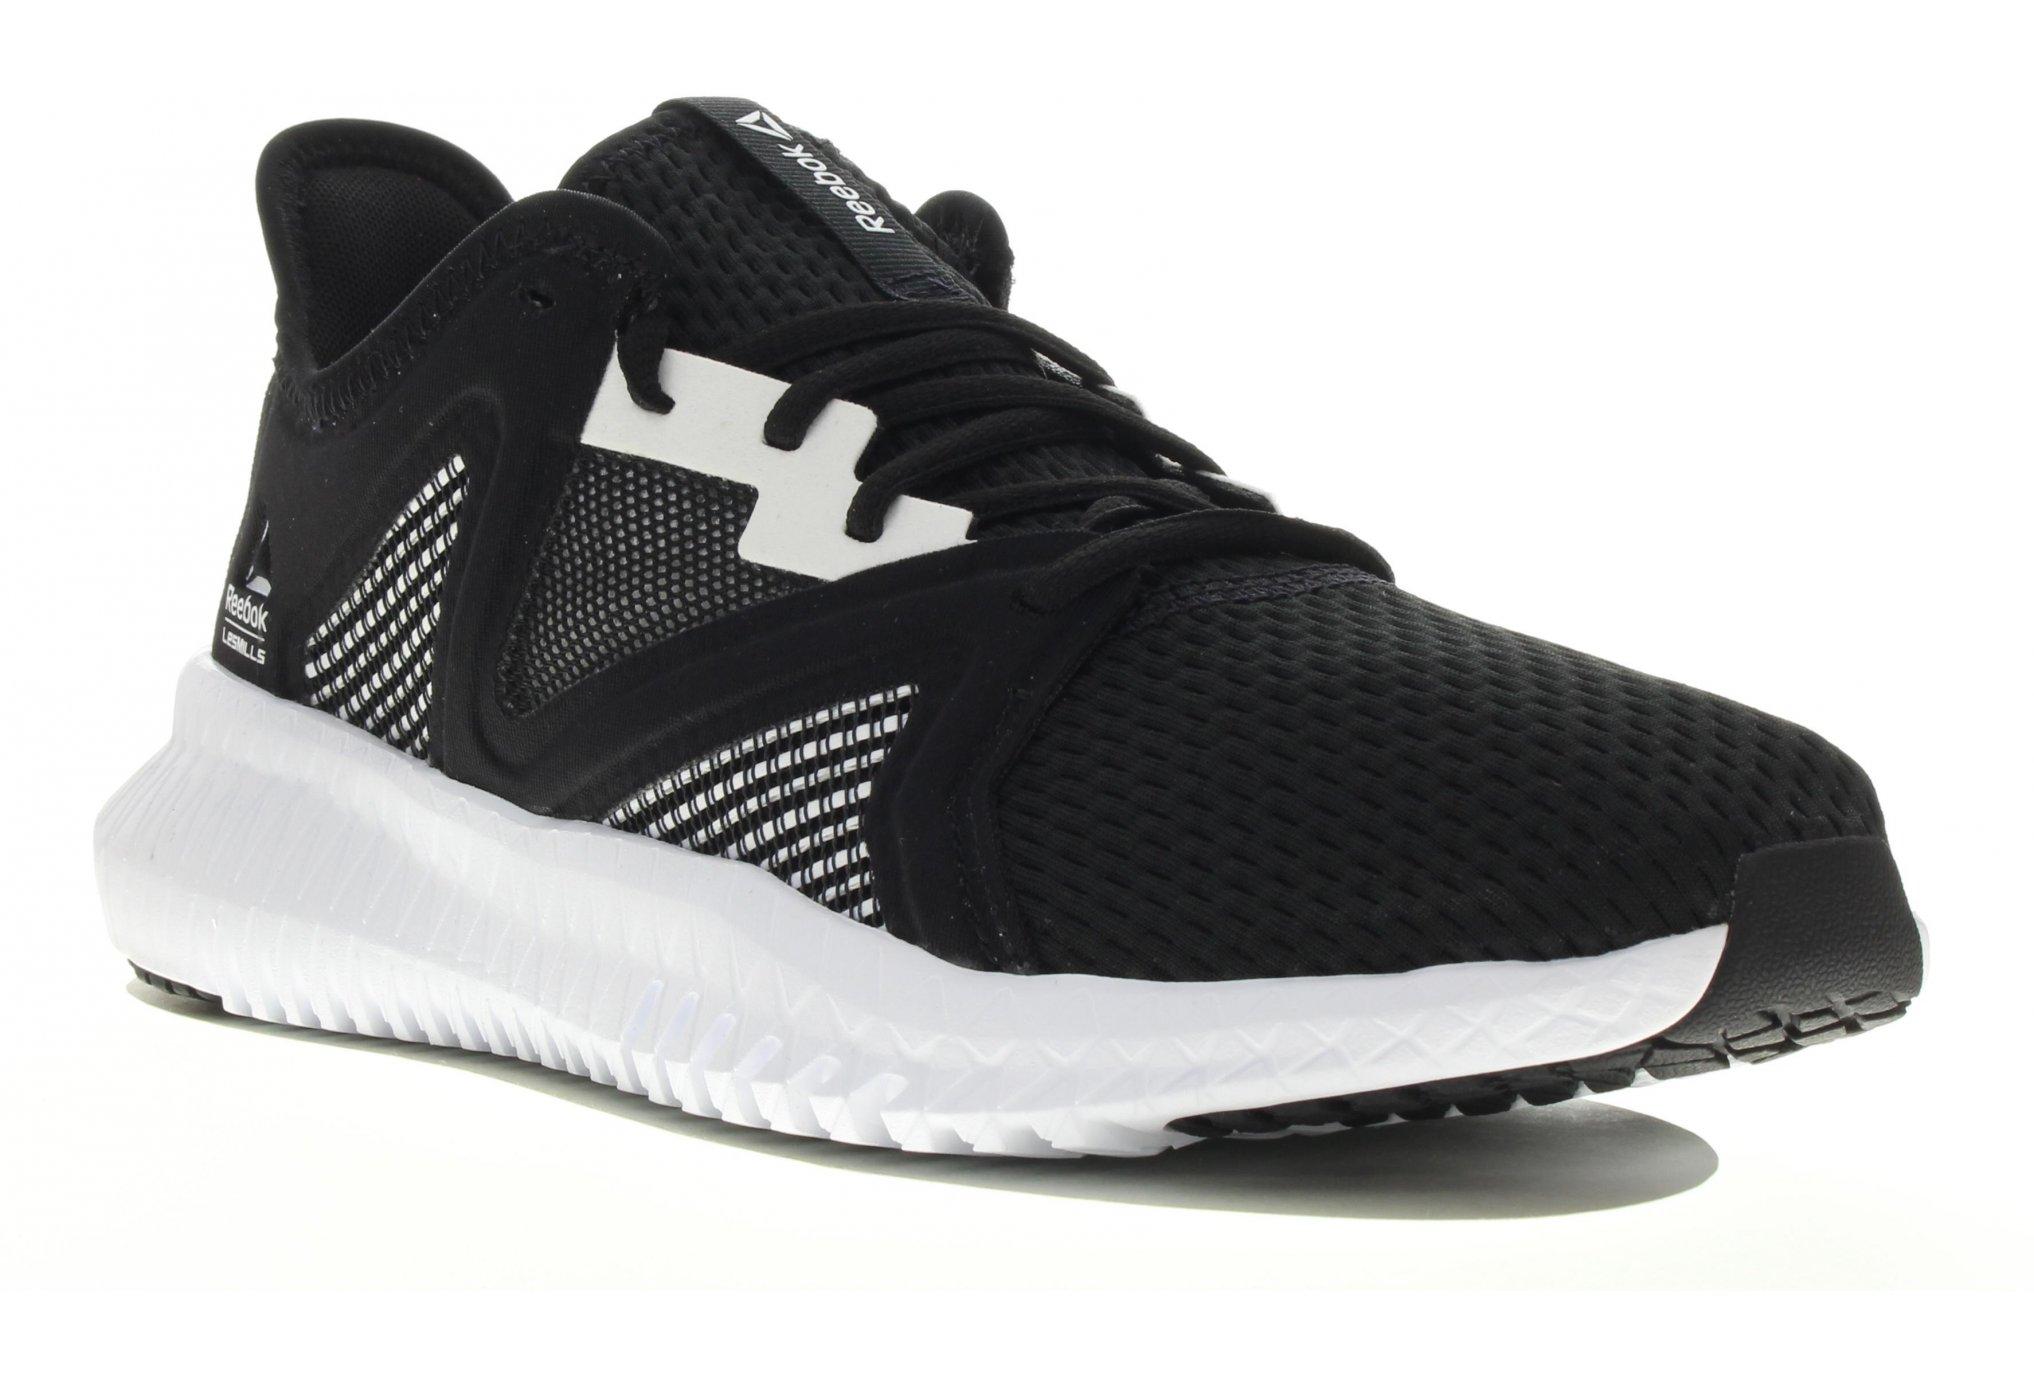 Reebok Flexagon 2.0 Flexweave Les Mills W Chaussures running femme